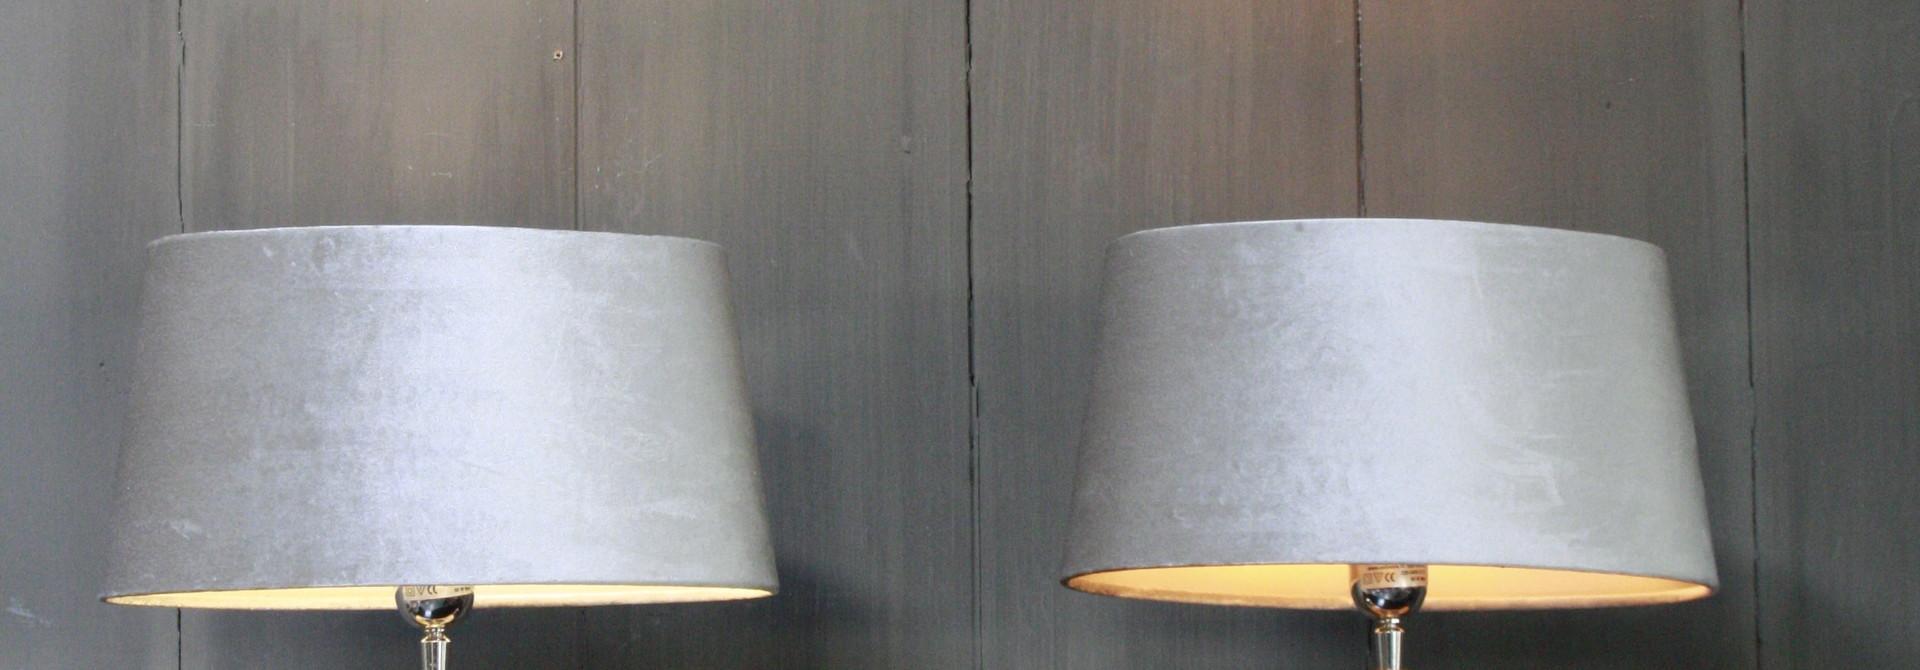 Tafellamp Vierkant Zilver + Velours kap Eric Kuster